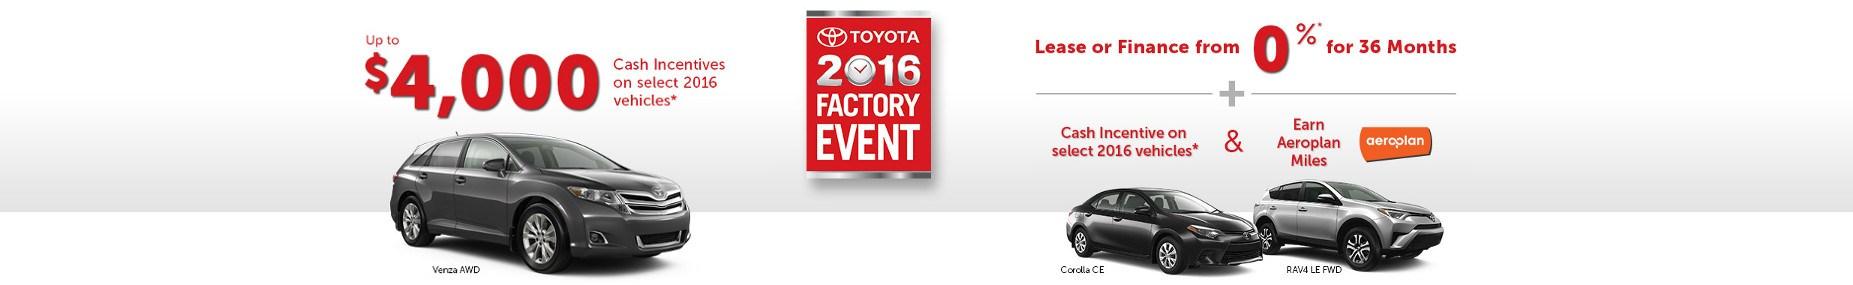 ToyotaFactoryEvent-Banner